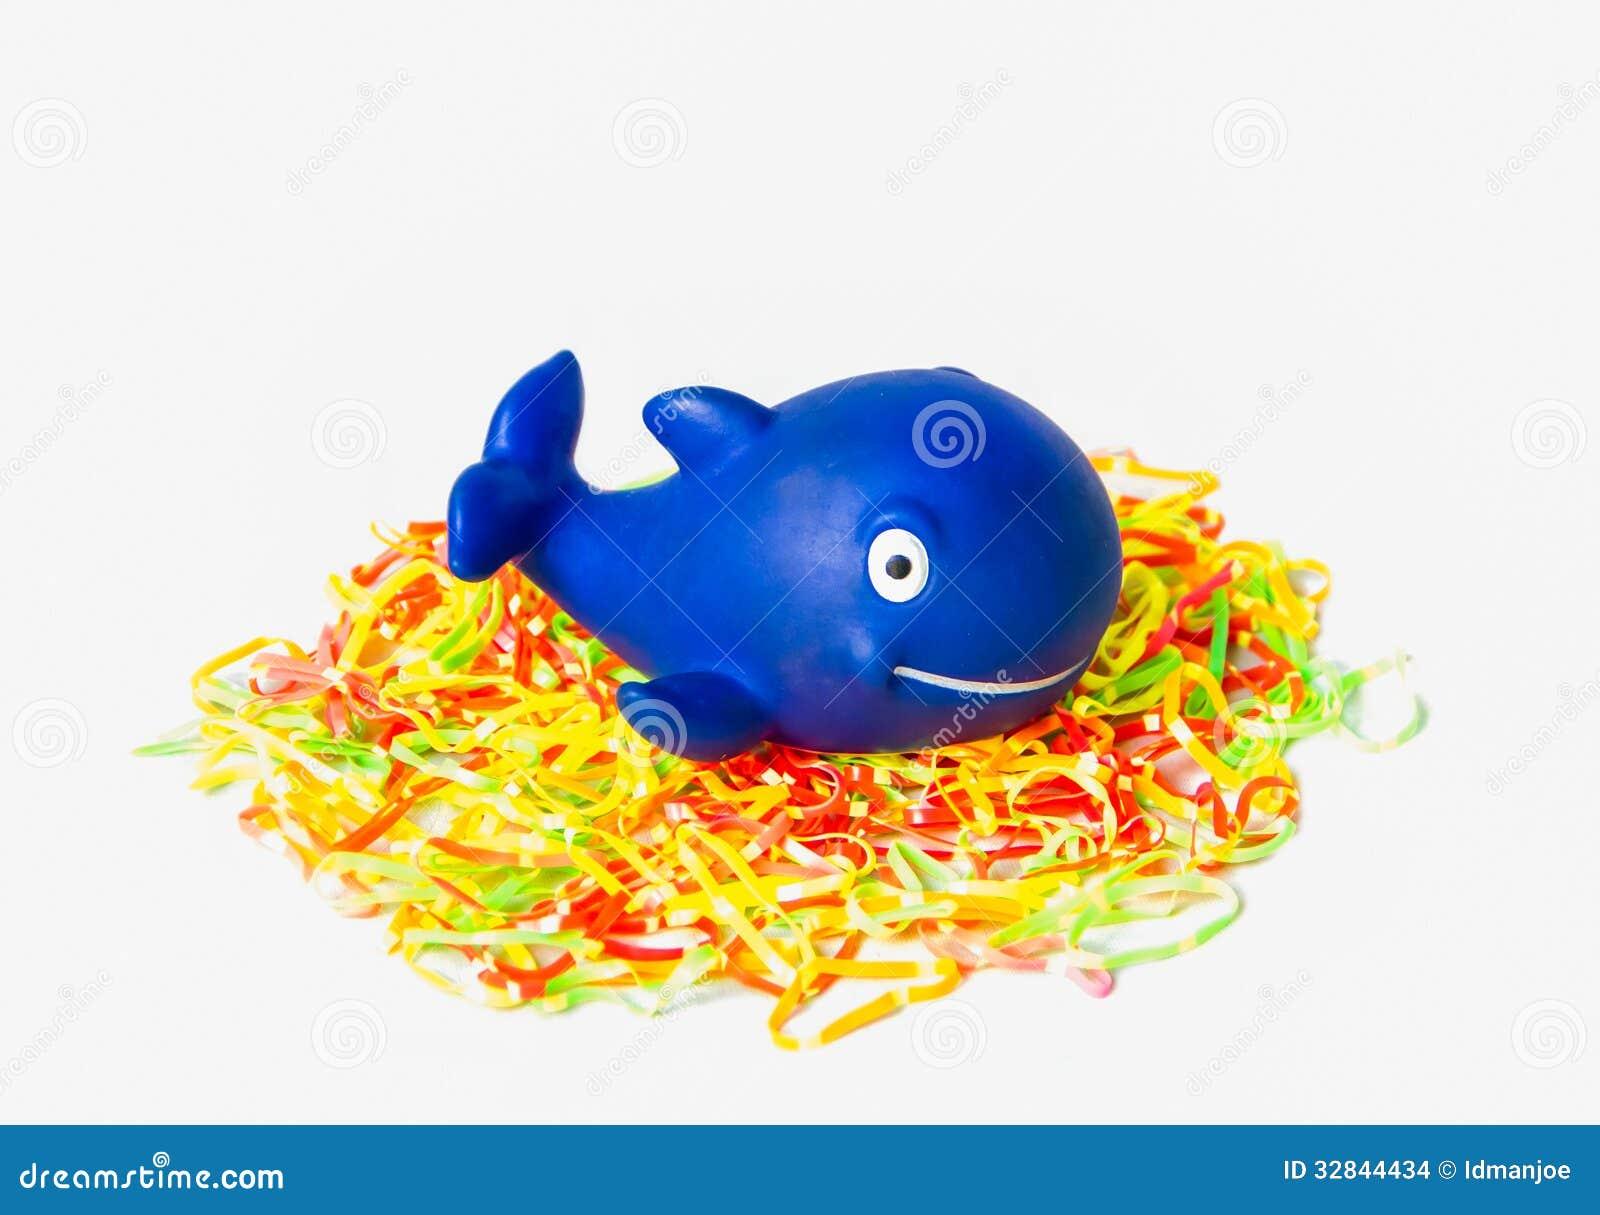 Blue rubber whale